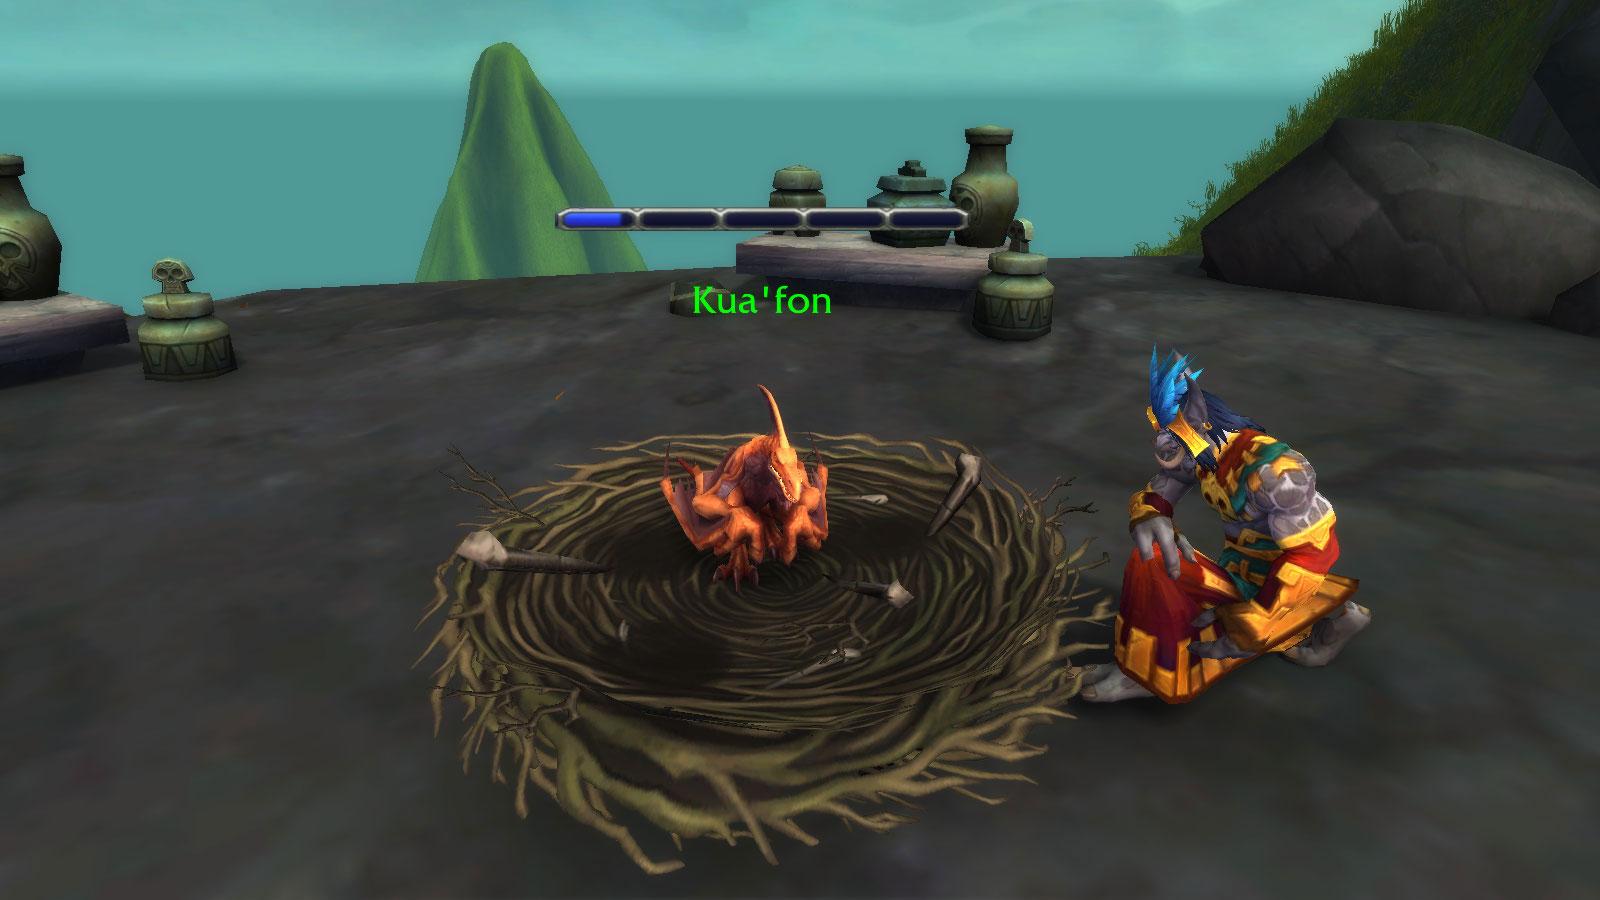 La barre de progression de Kua'fon se remplit